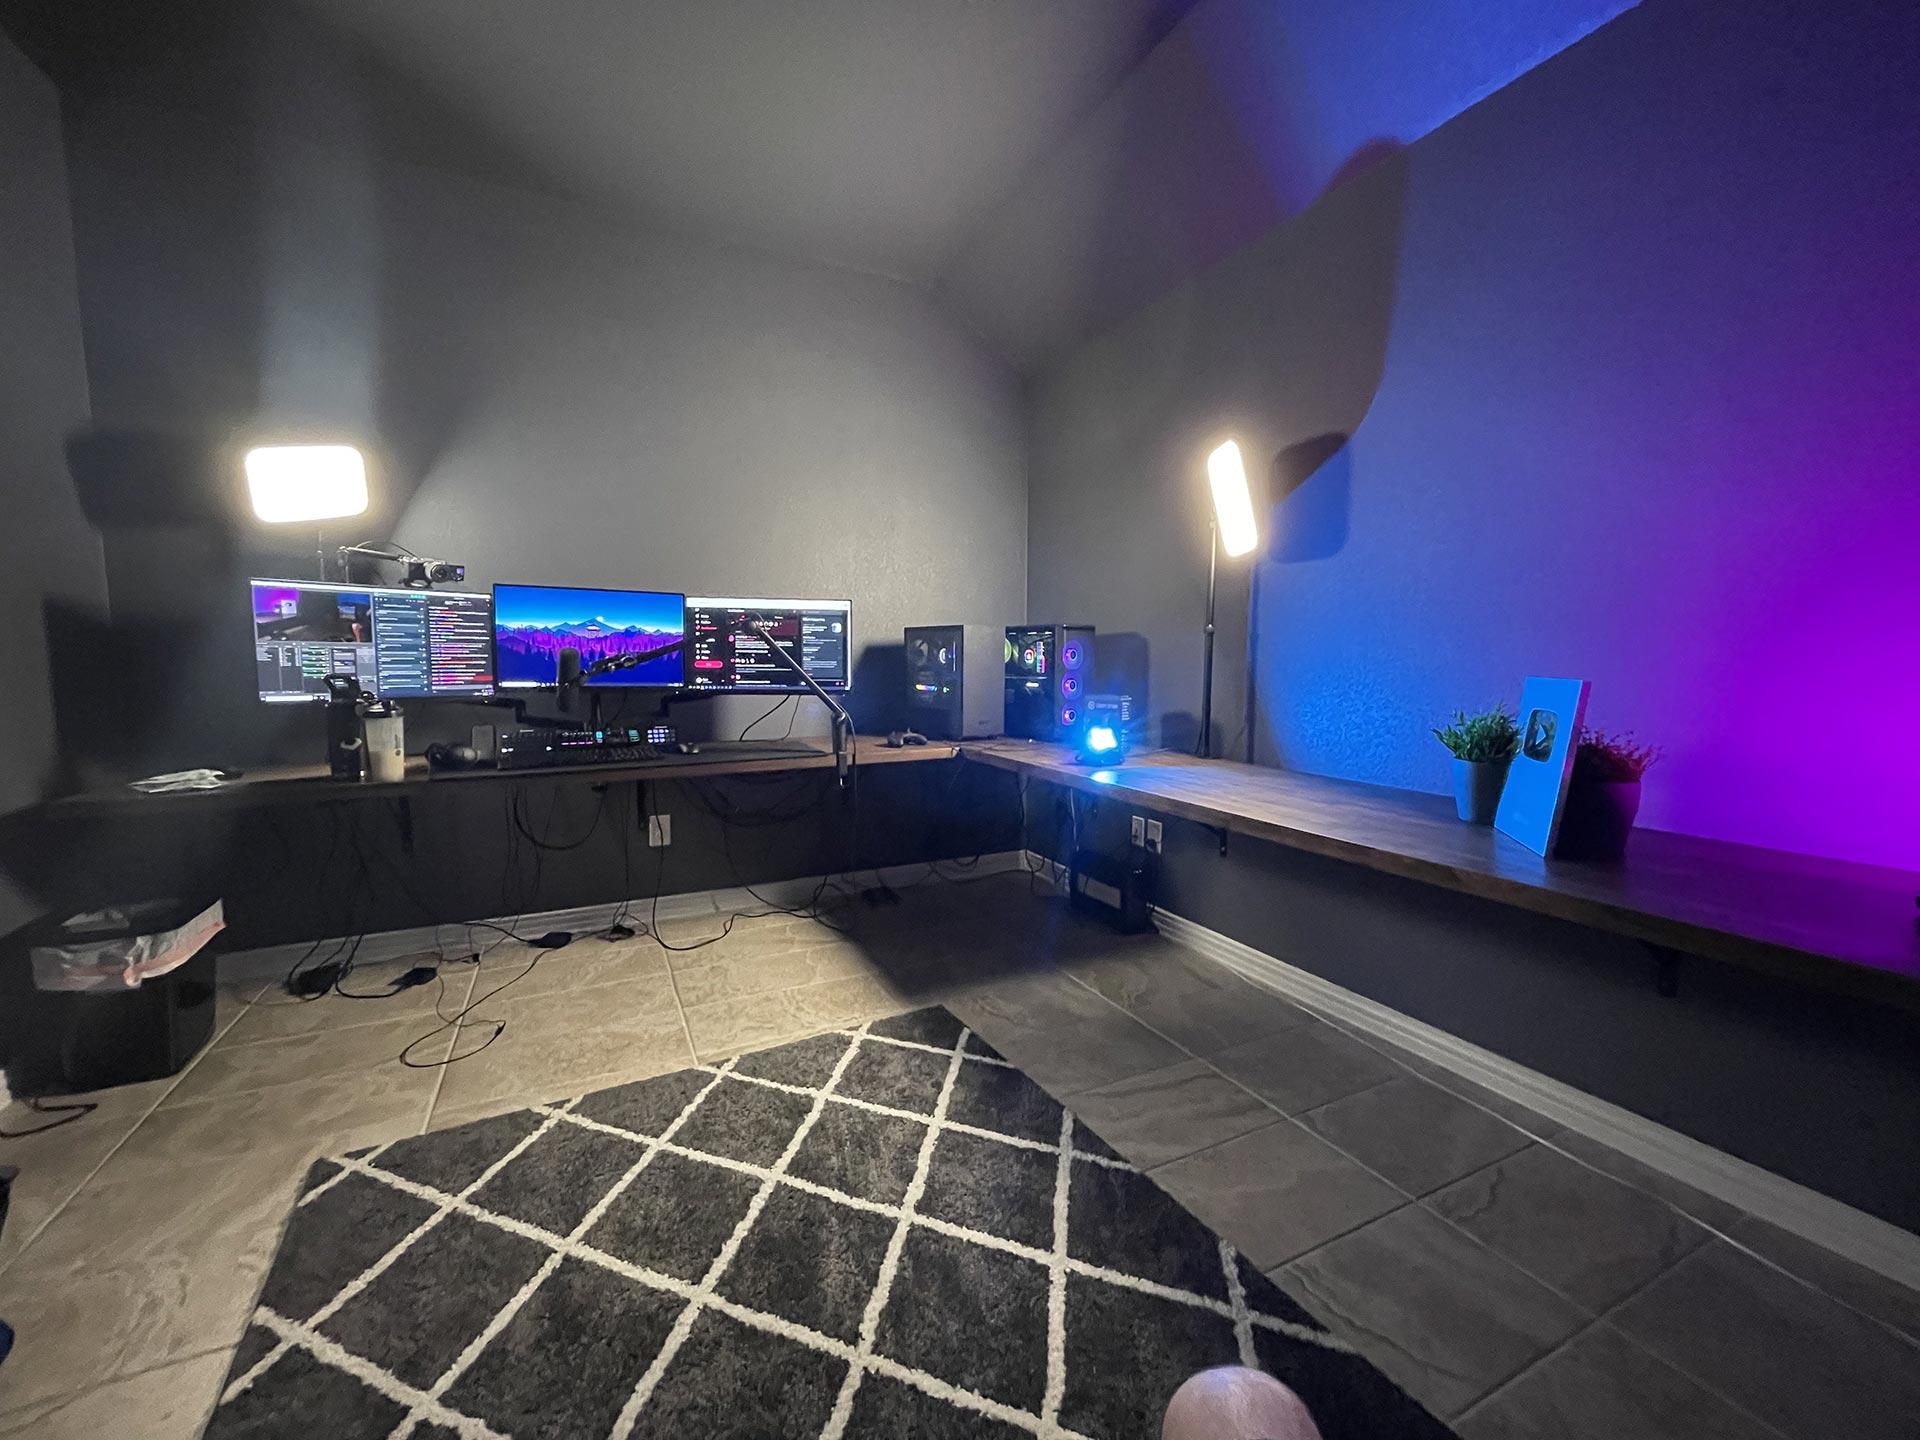 Expel Gaming Room Setup